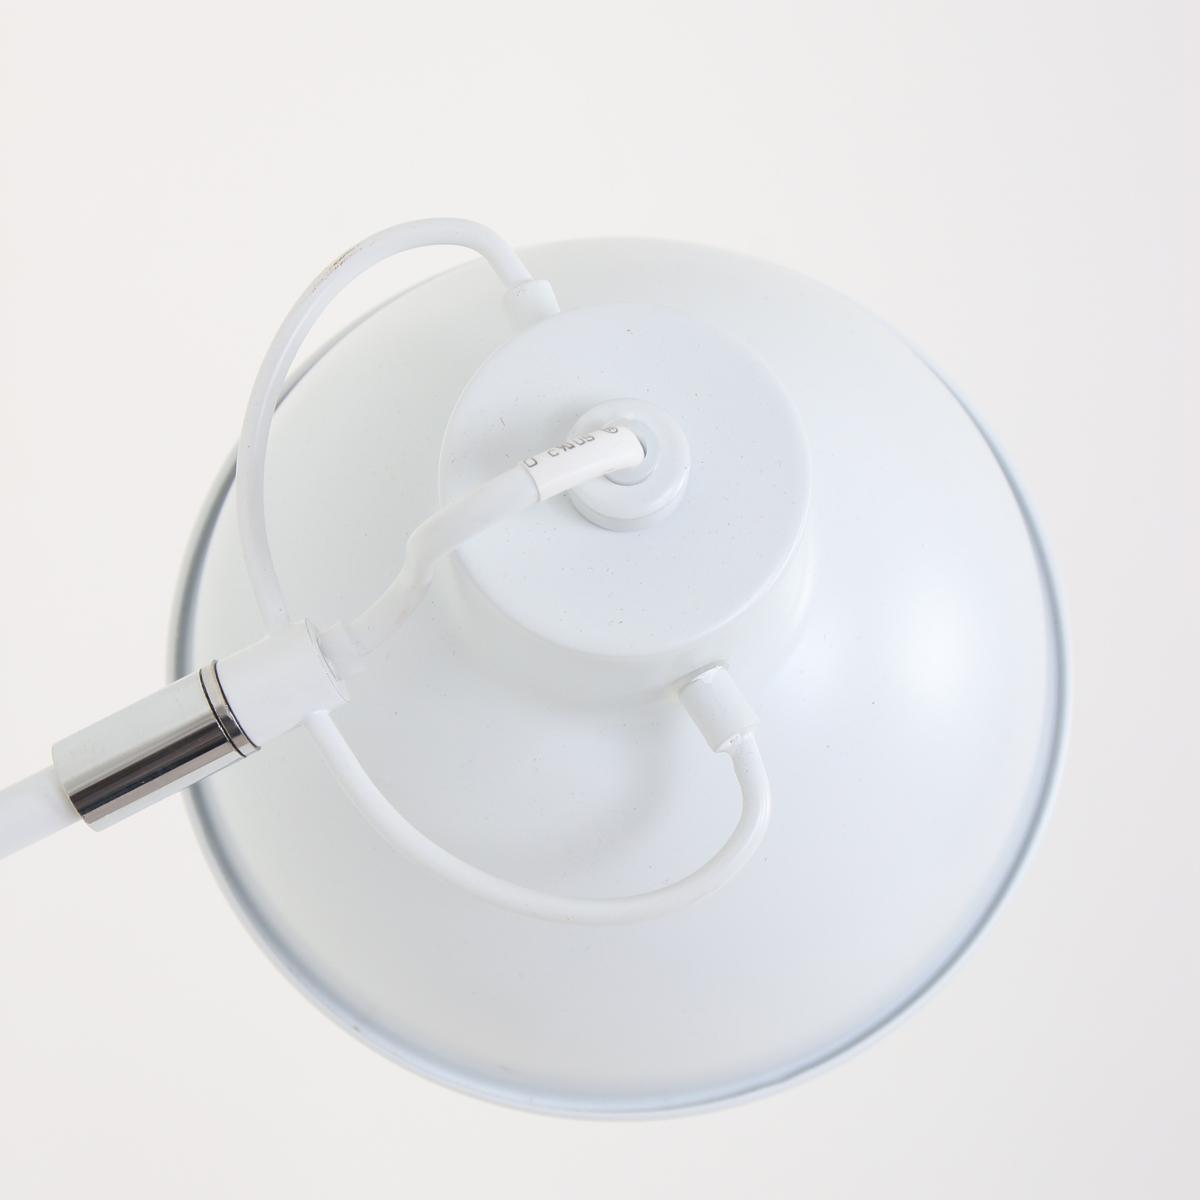 applique murale blanc alexa 16 cm lampe industrielle. Black Bedroom Furniture Sets. Home Design Ideas